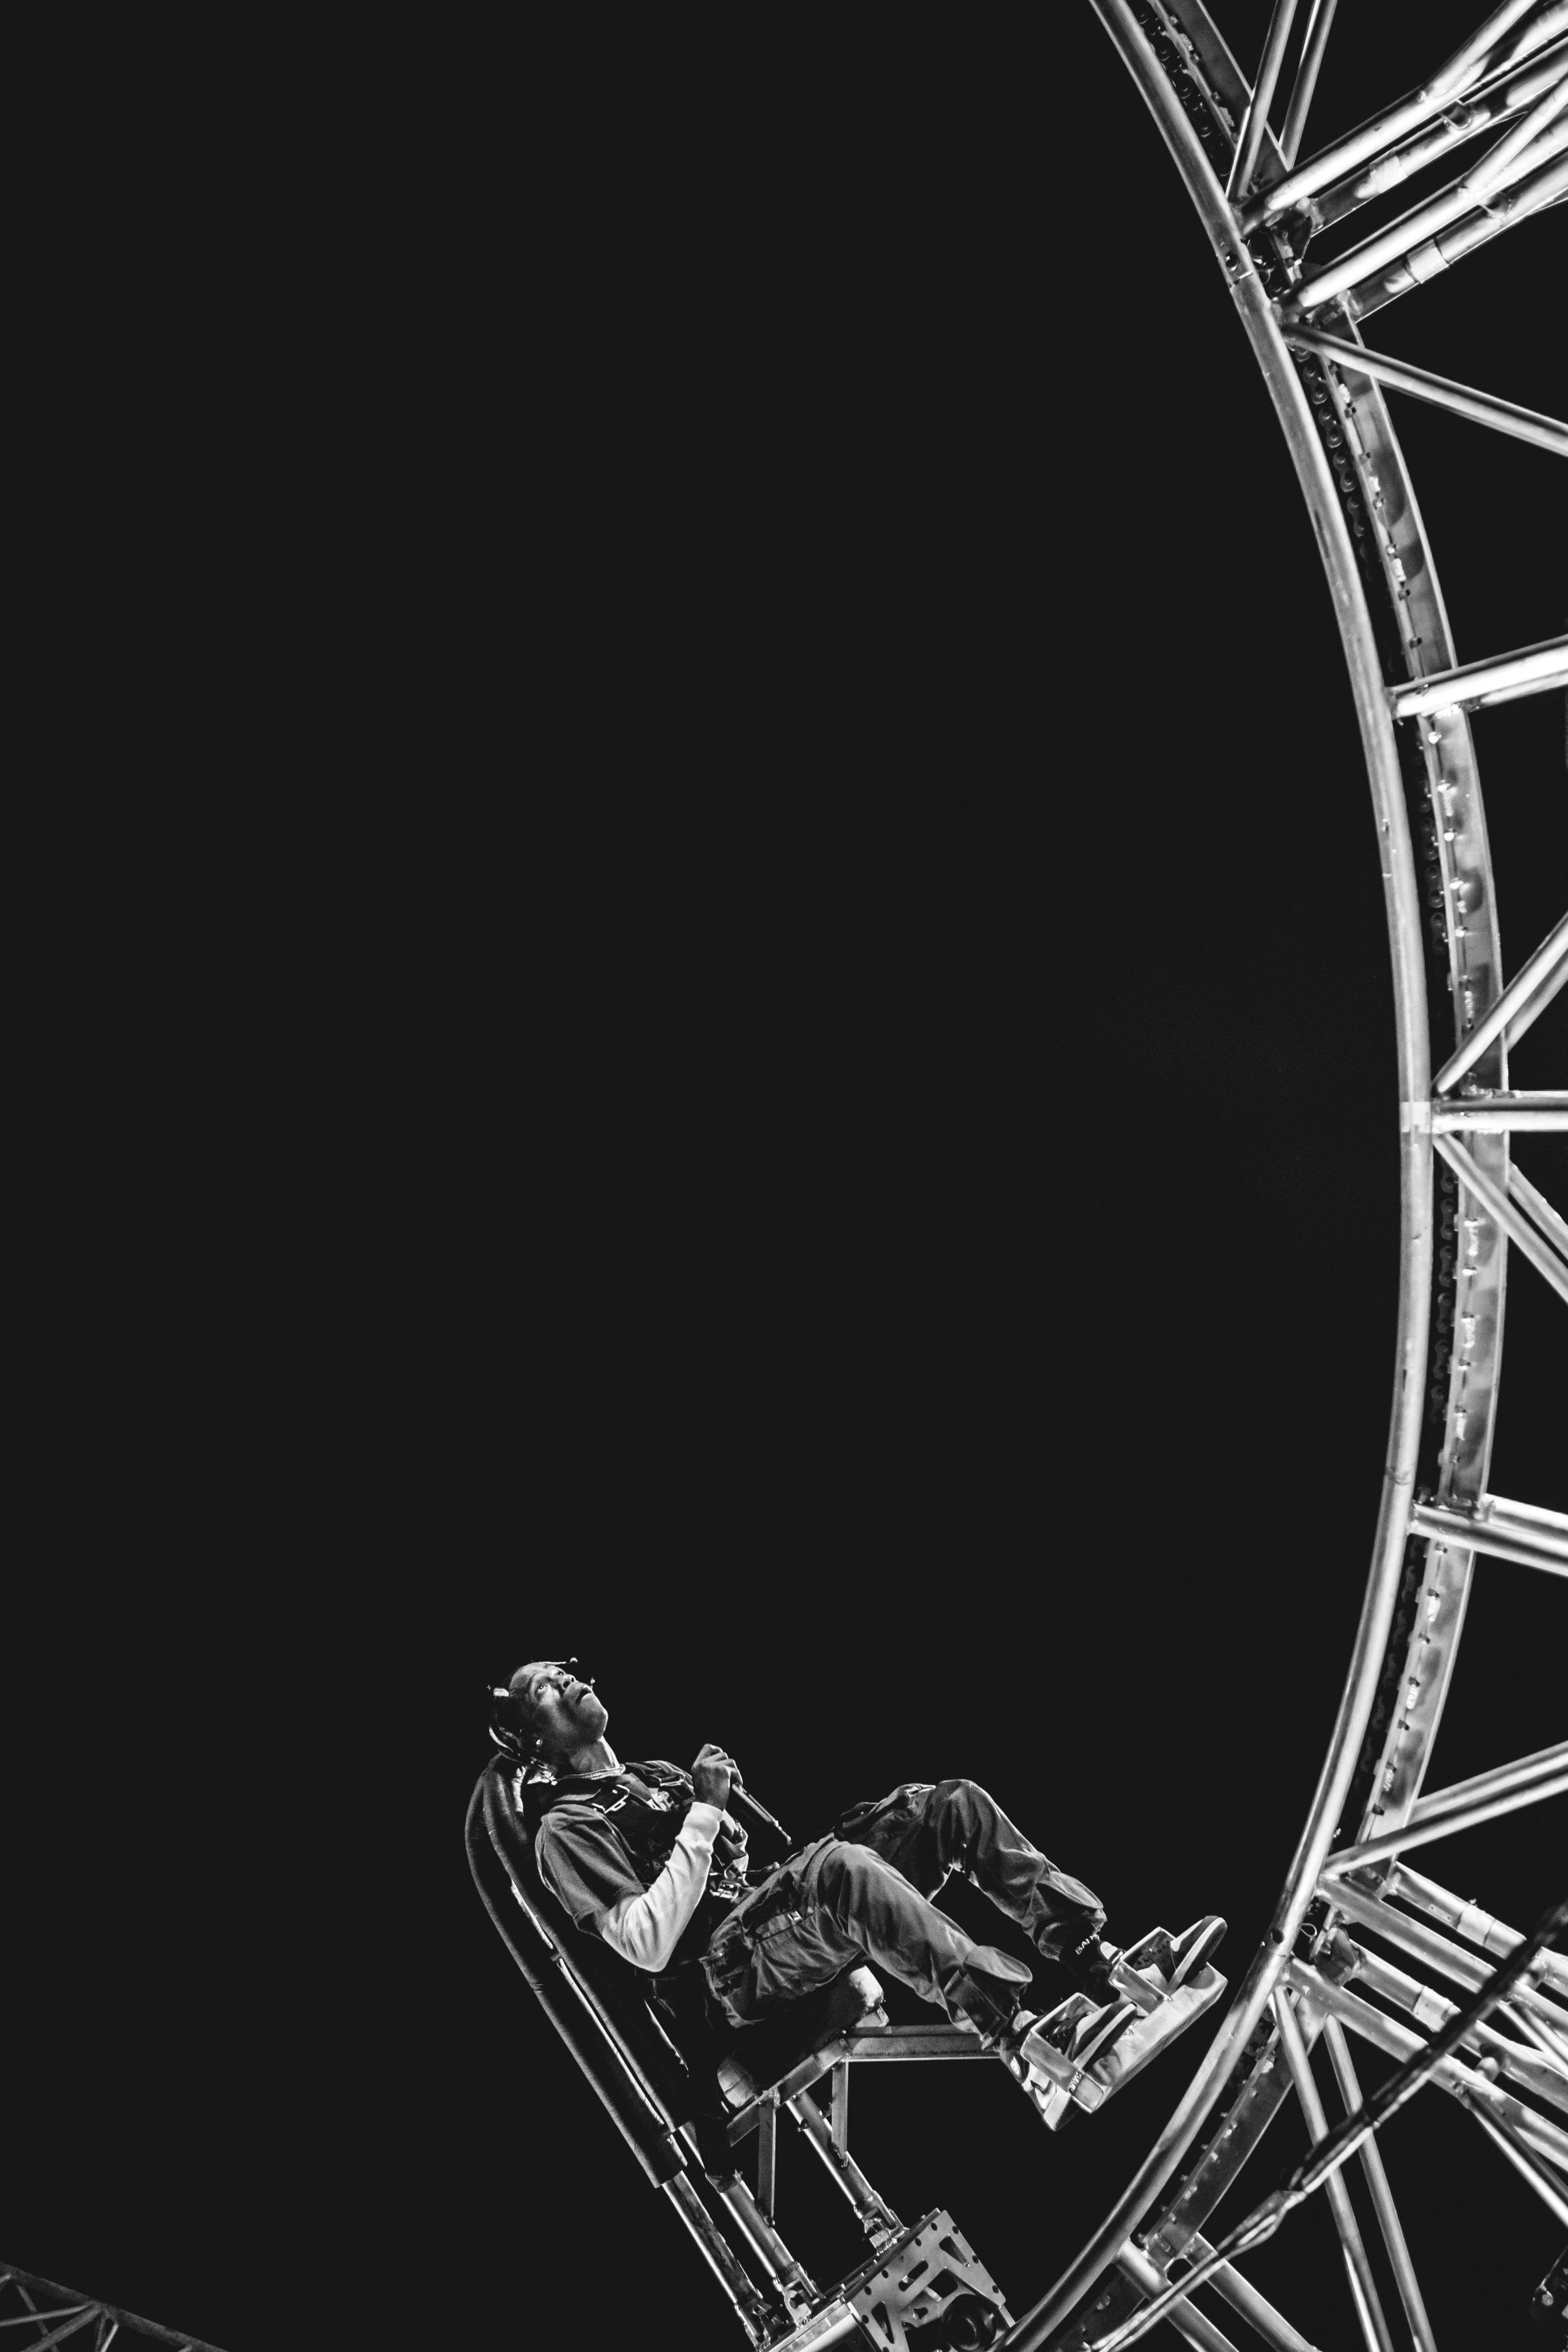 Travis Scott_16_AstroworldFestival2018_Branndannart.JPG